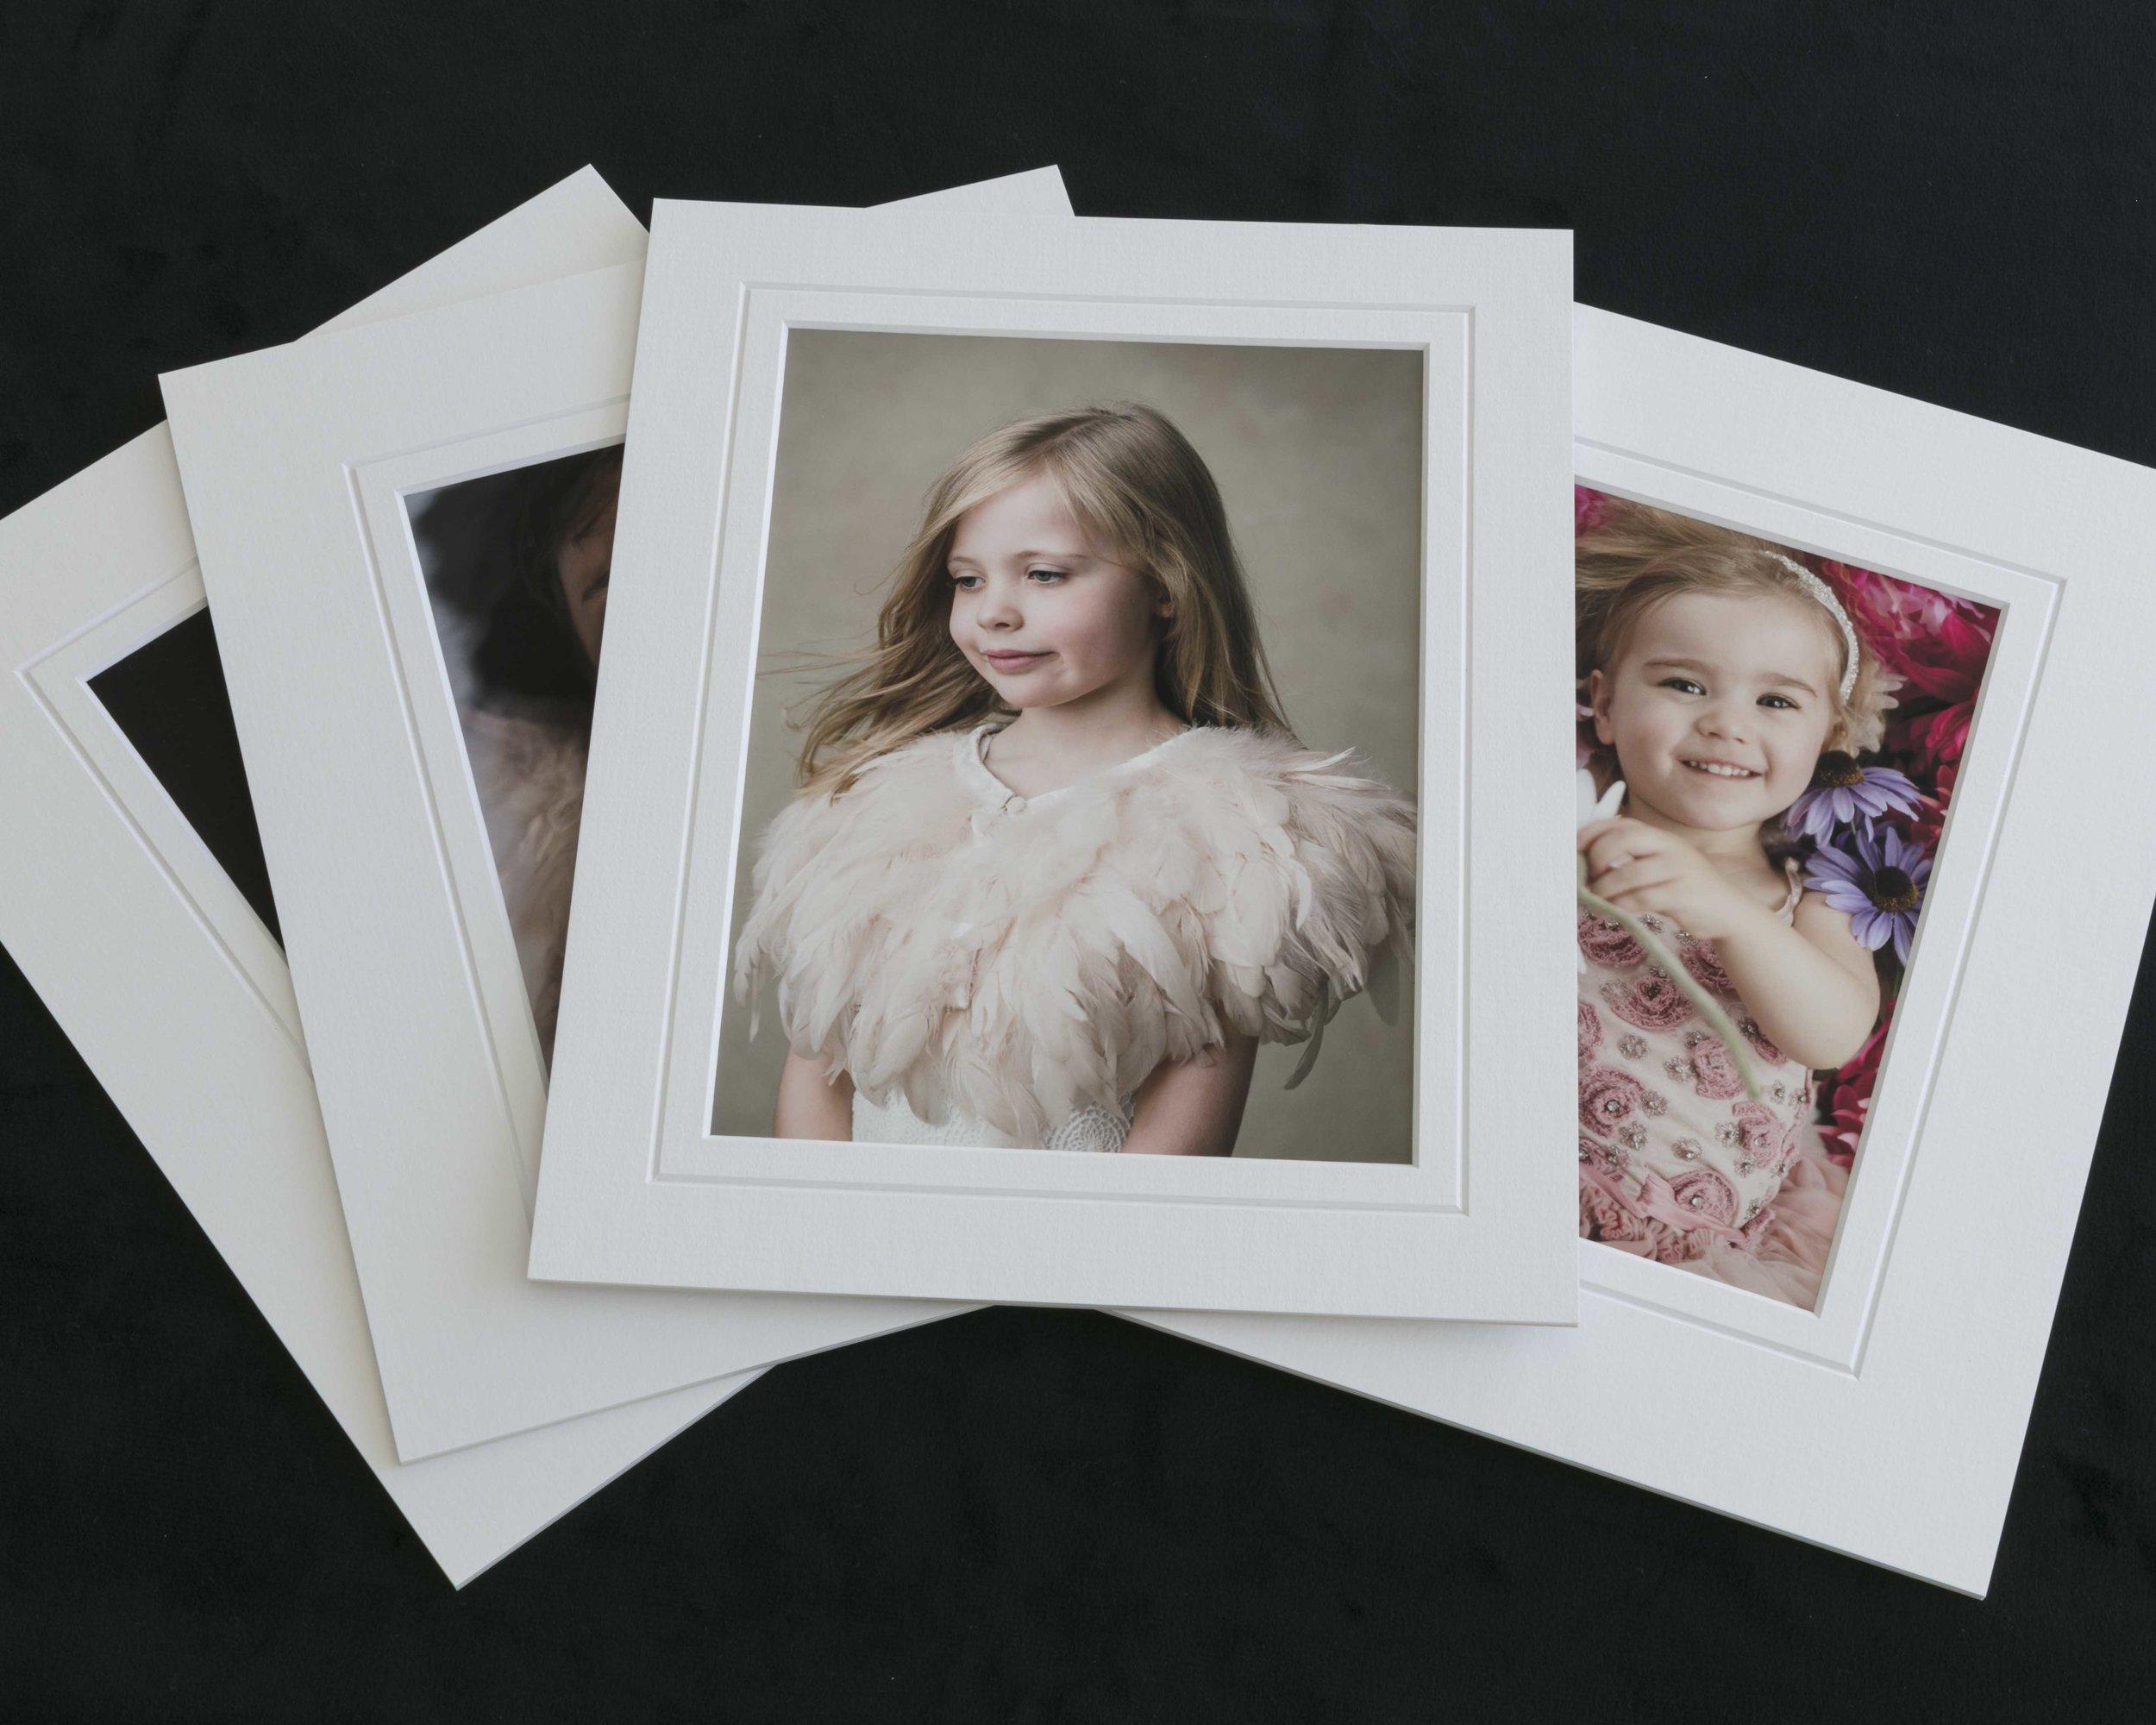 marina-mcdonald-pricing-child-portrait-photography-canberra